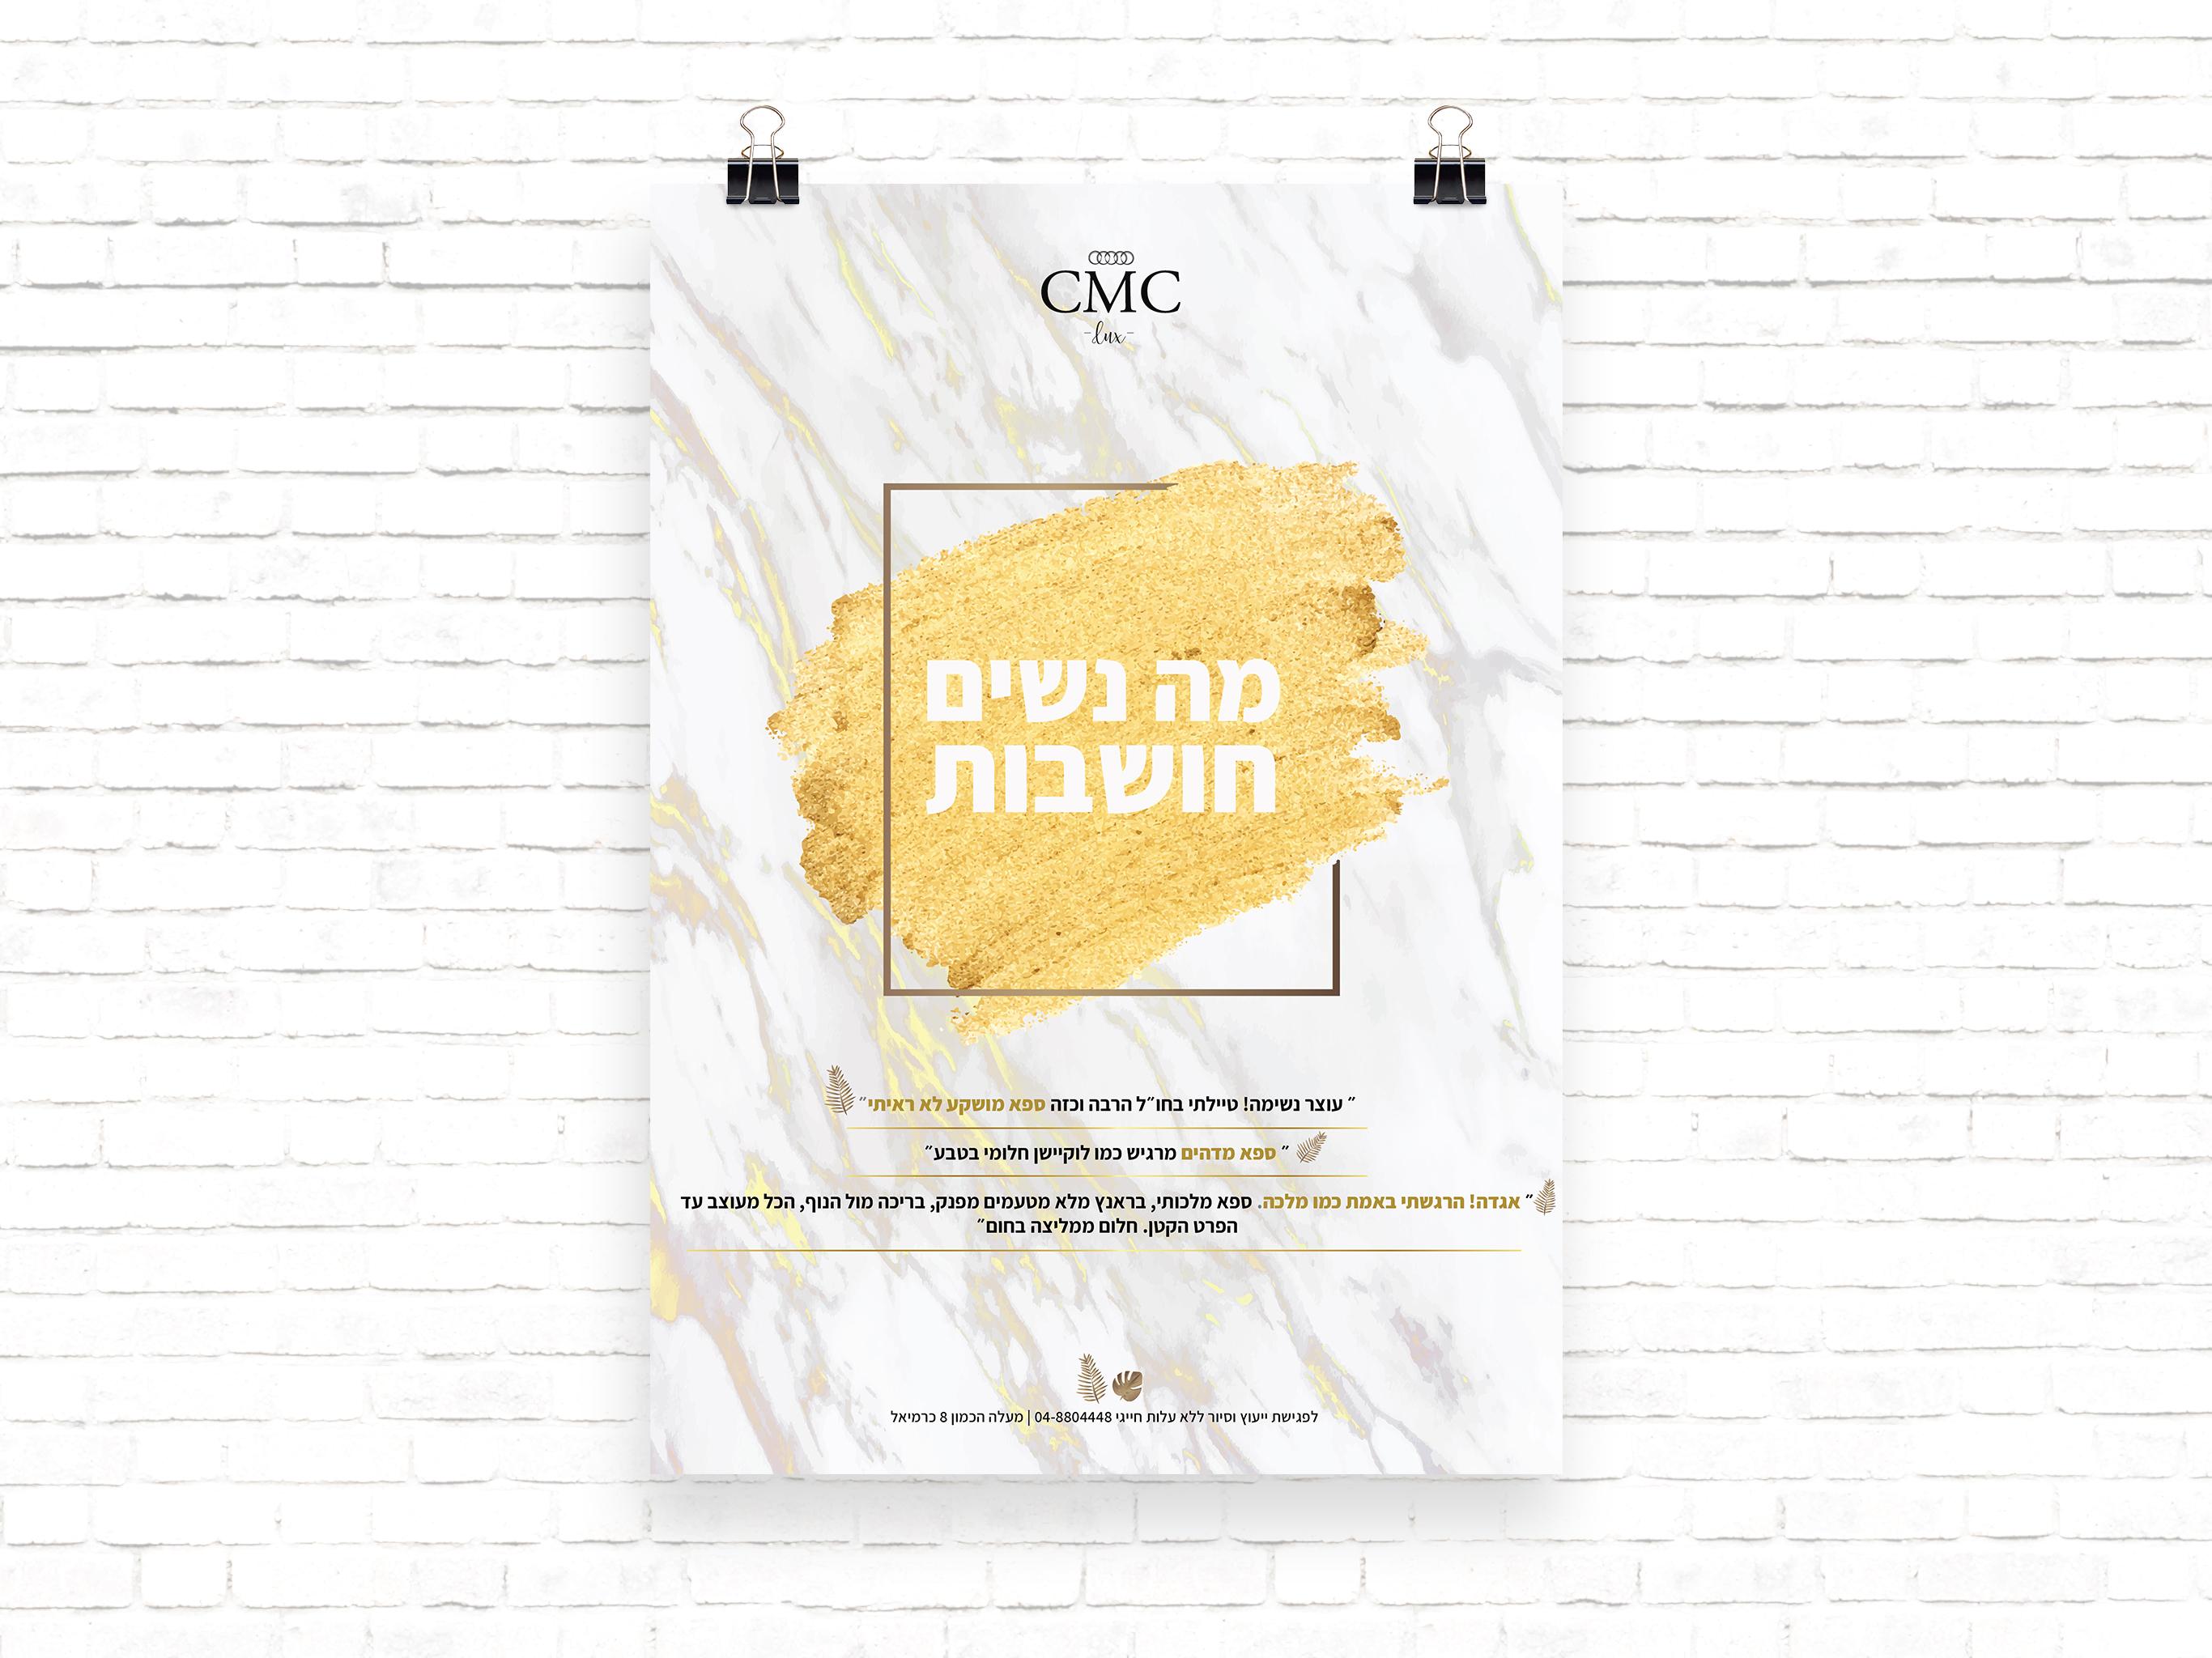 logo cmc2